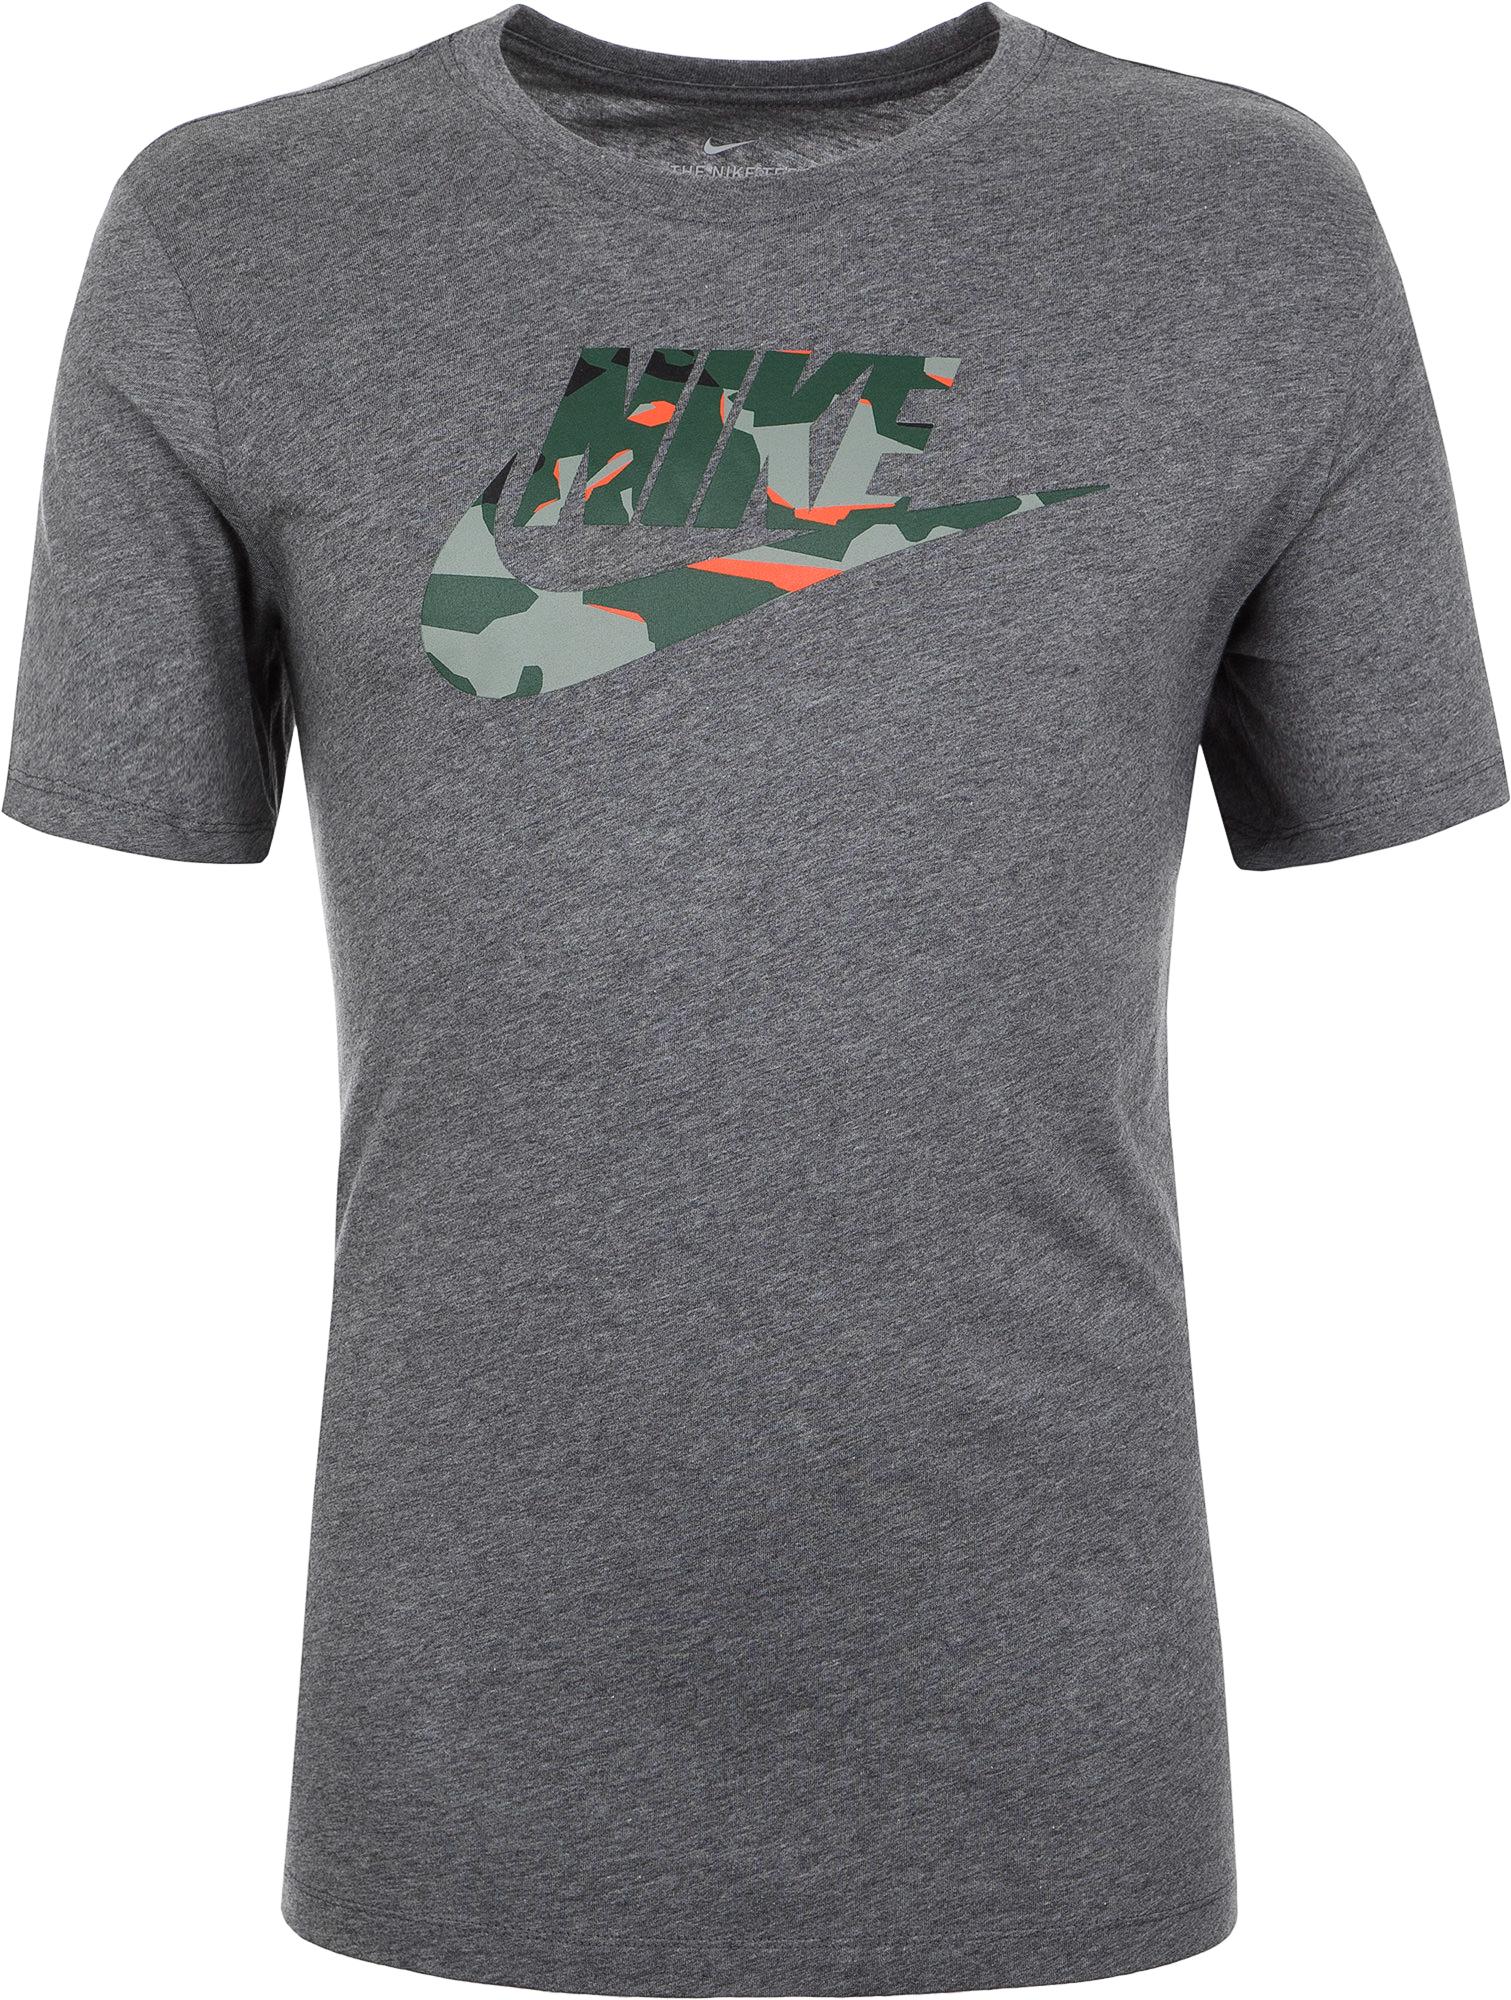 Nike Футболка мужская Nike Sportswear, размер 50-52